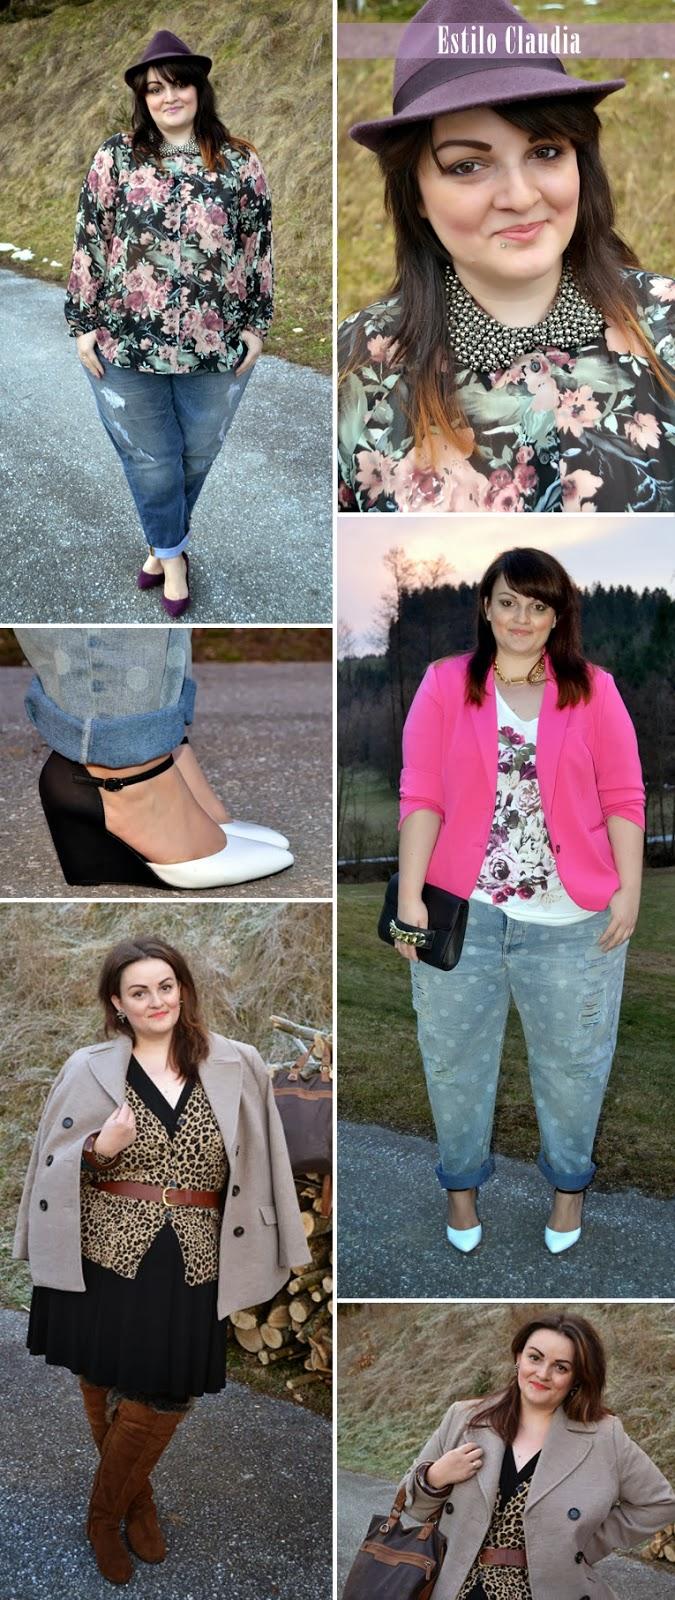 Curves Claudia, pluss size, plus, linda, estilo, ela tem estilo, moda, fashion, blogueira, blogger